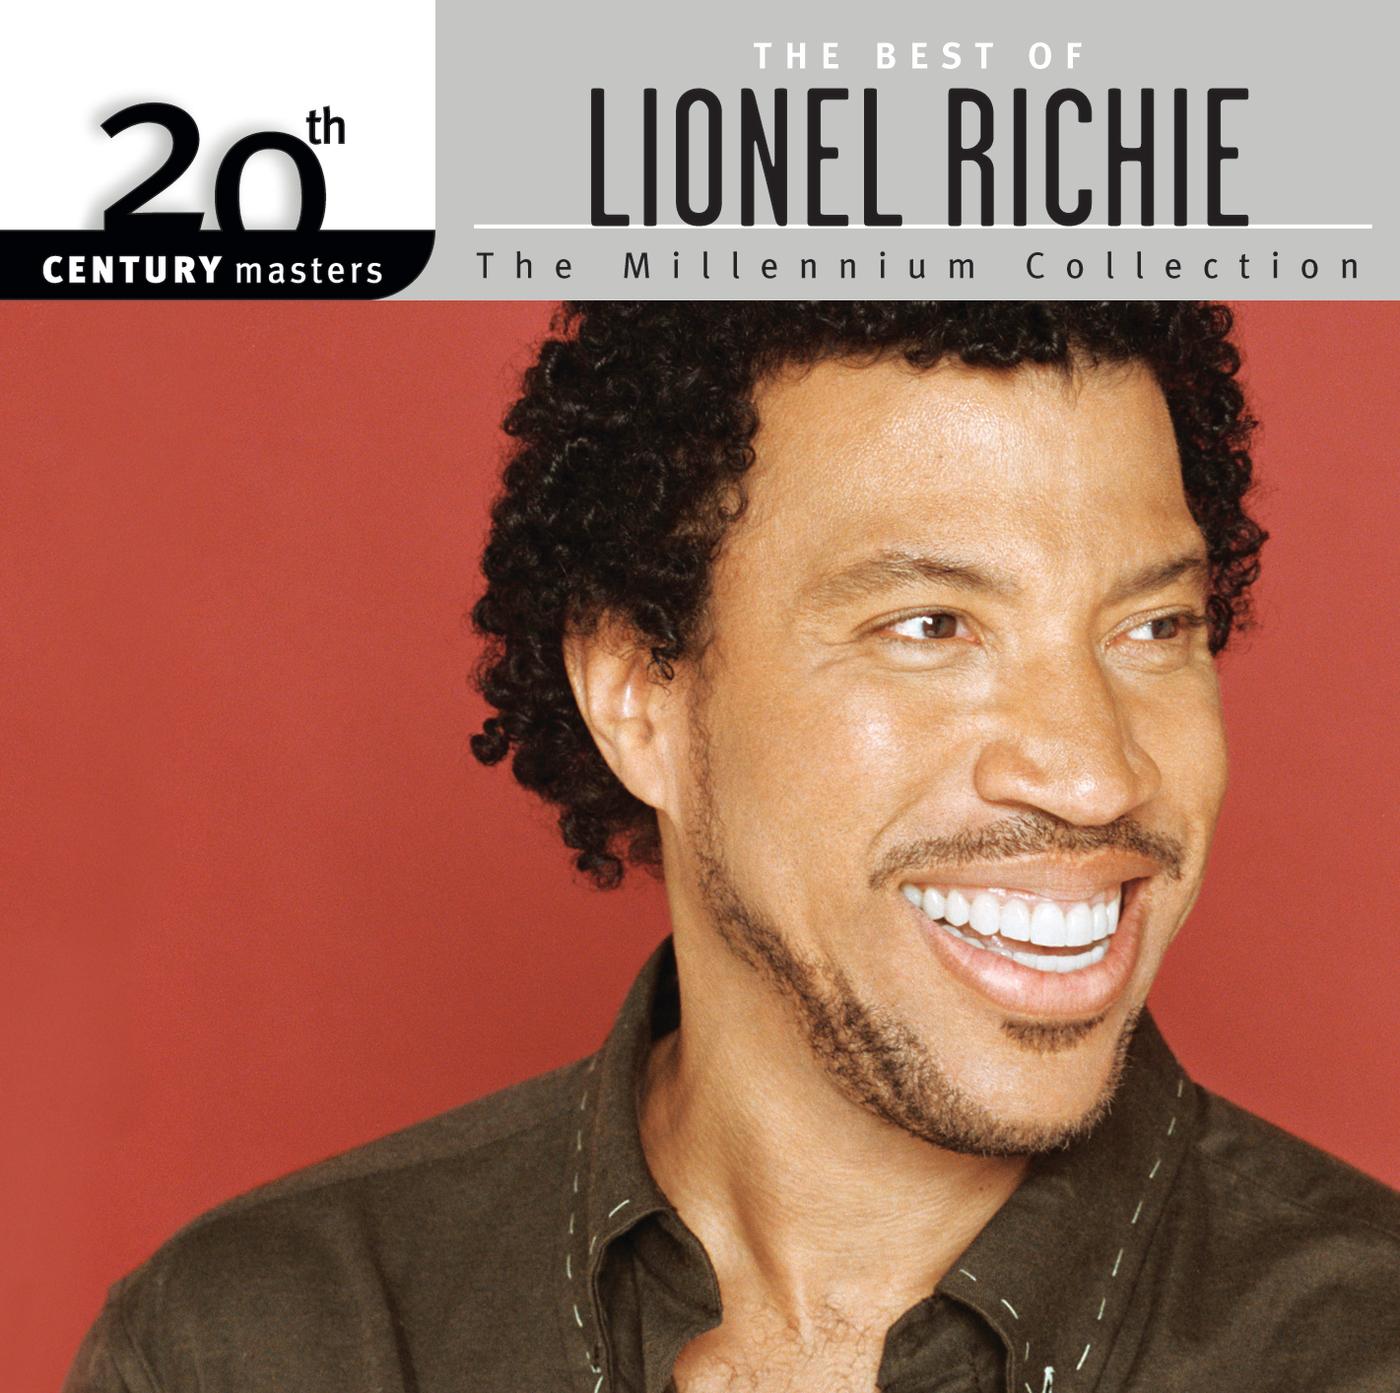 Jesus is love [music download]: lionel richie christianbook. Com.